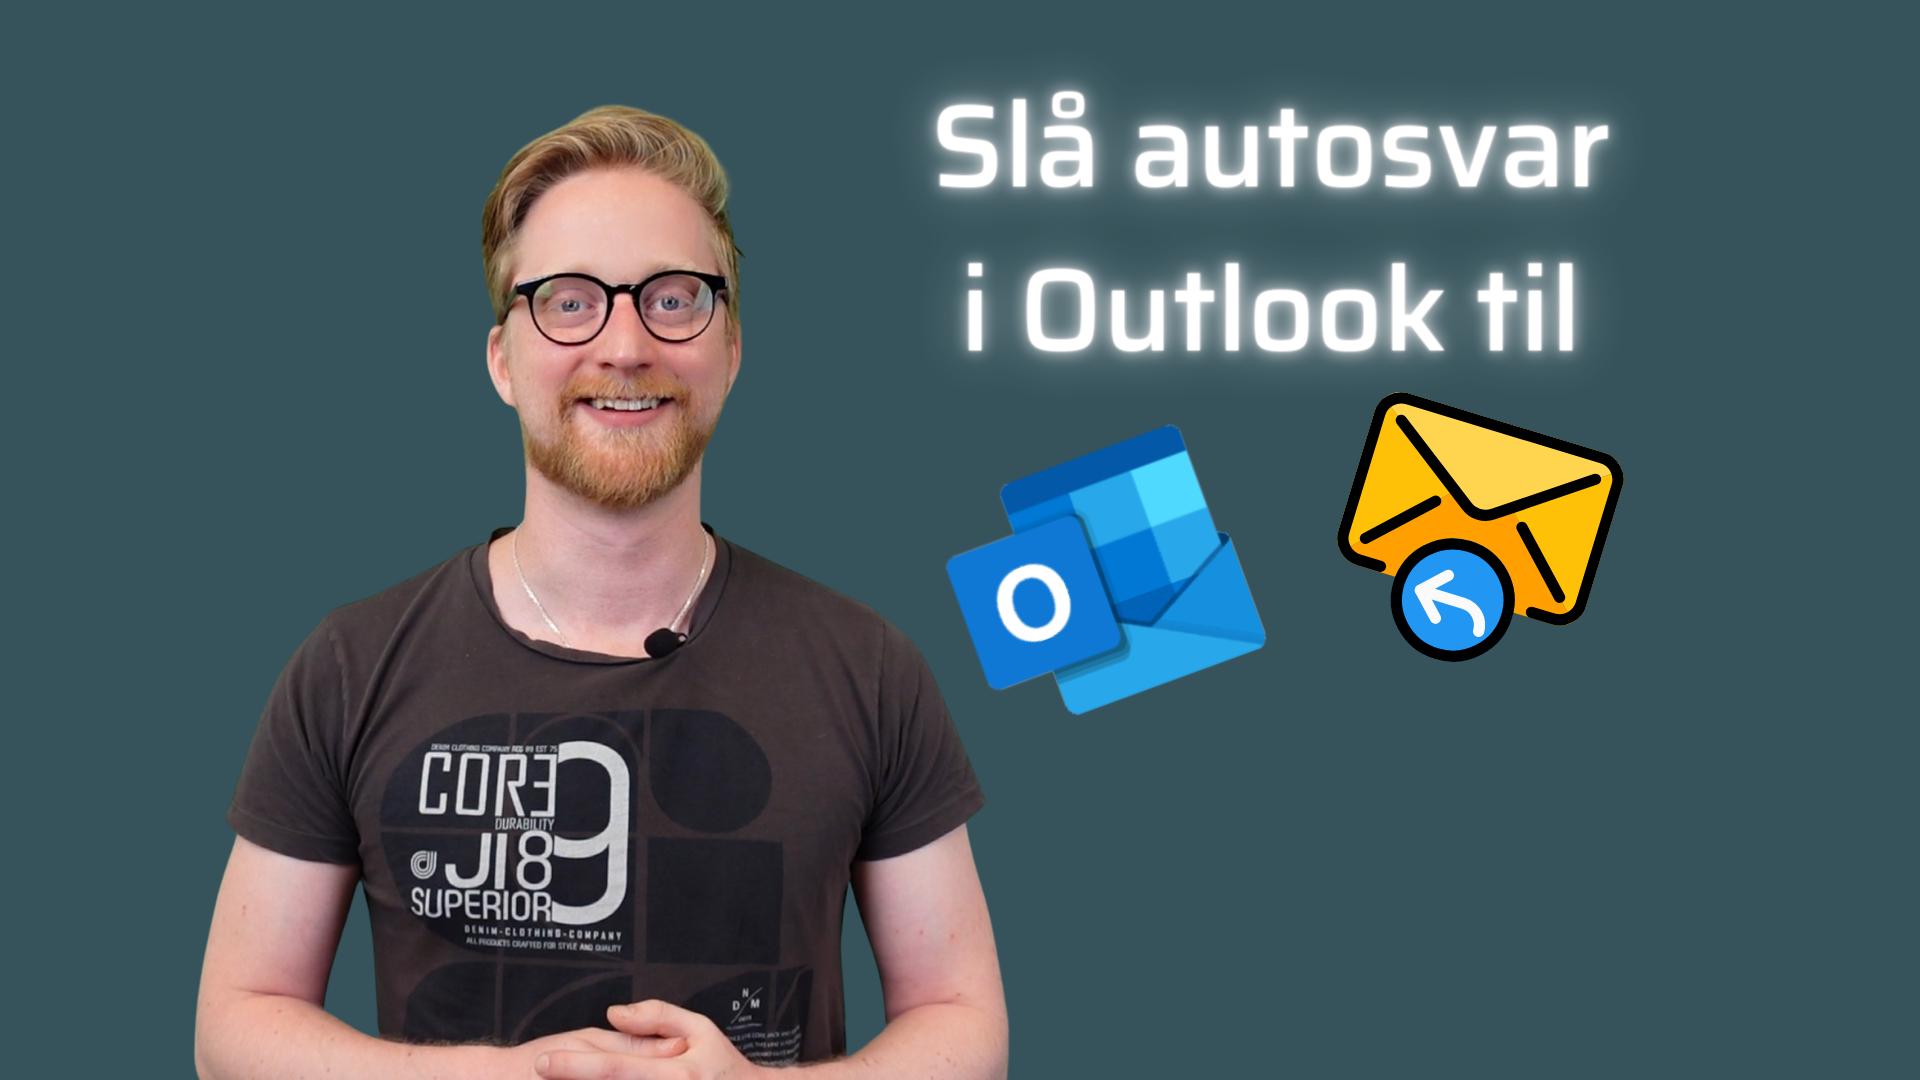 Slå autosvar i Outlook til (1)